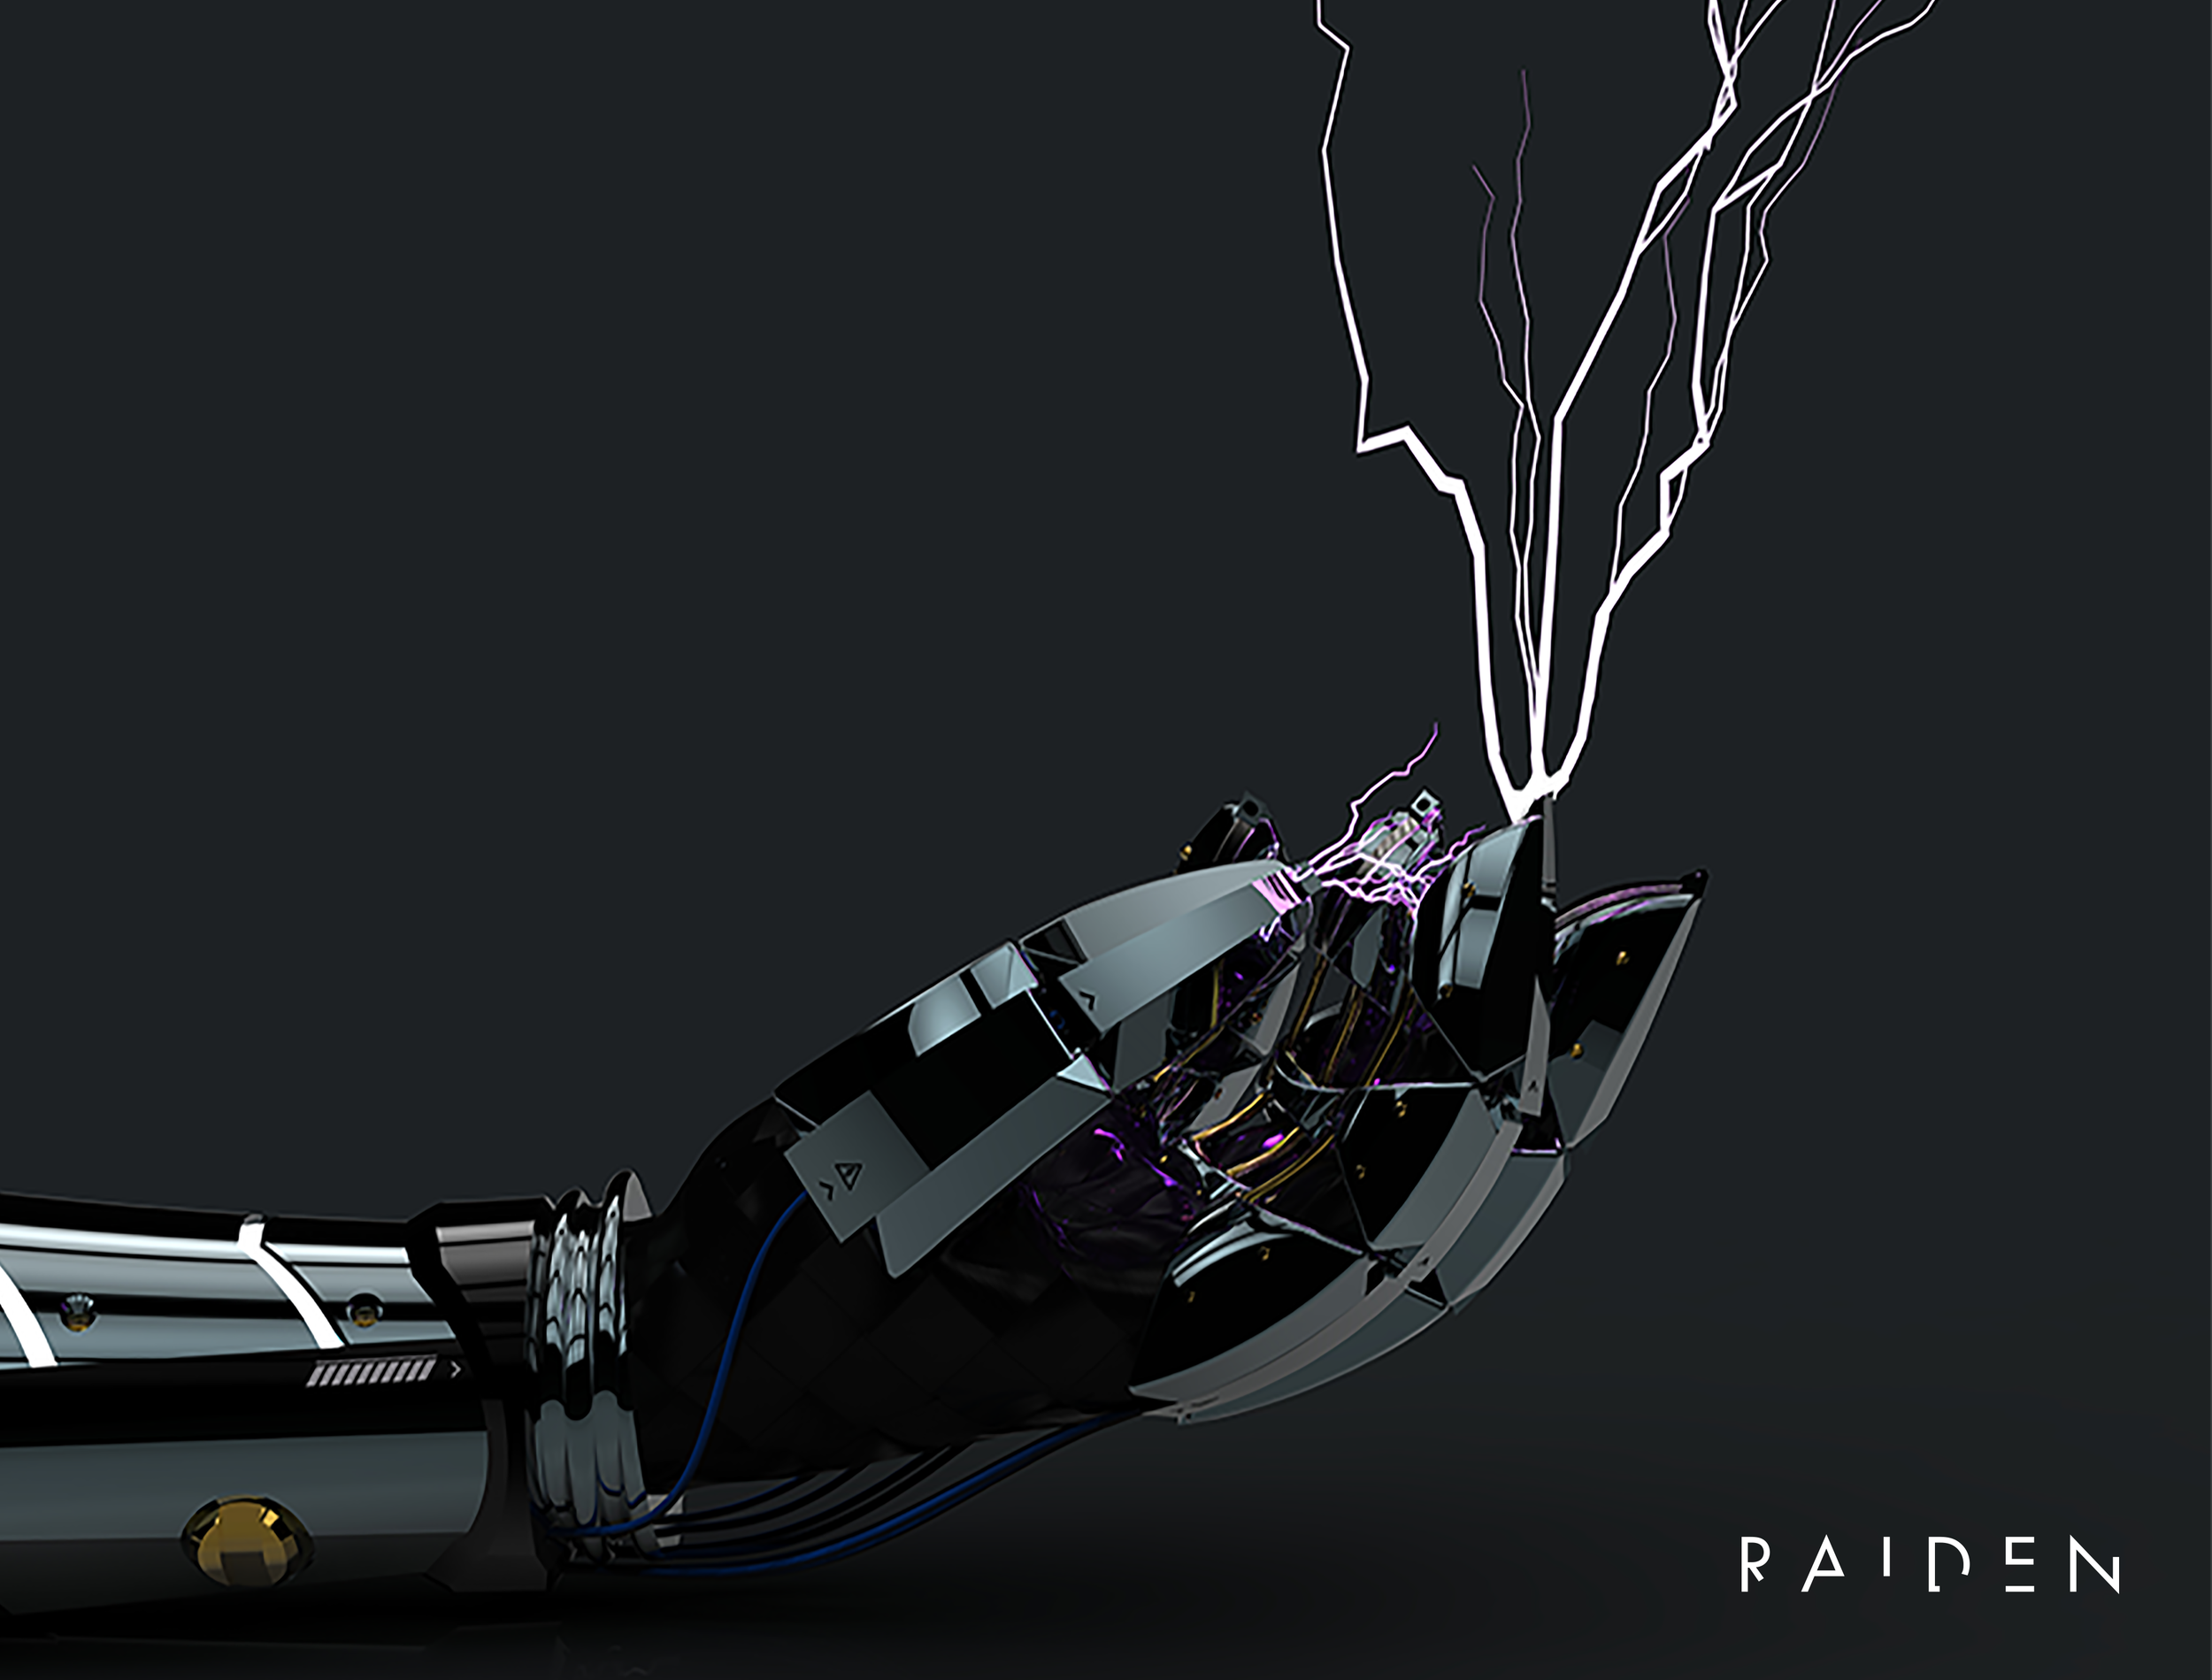 Raiden_05.png